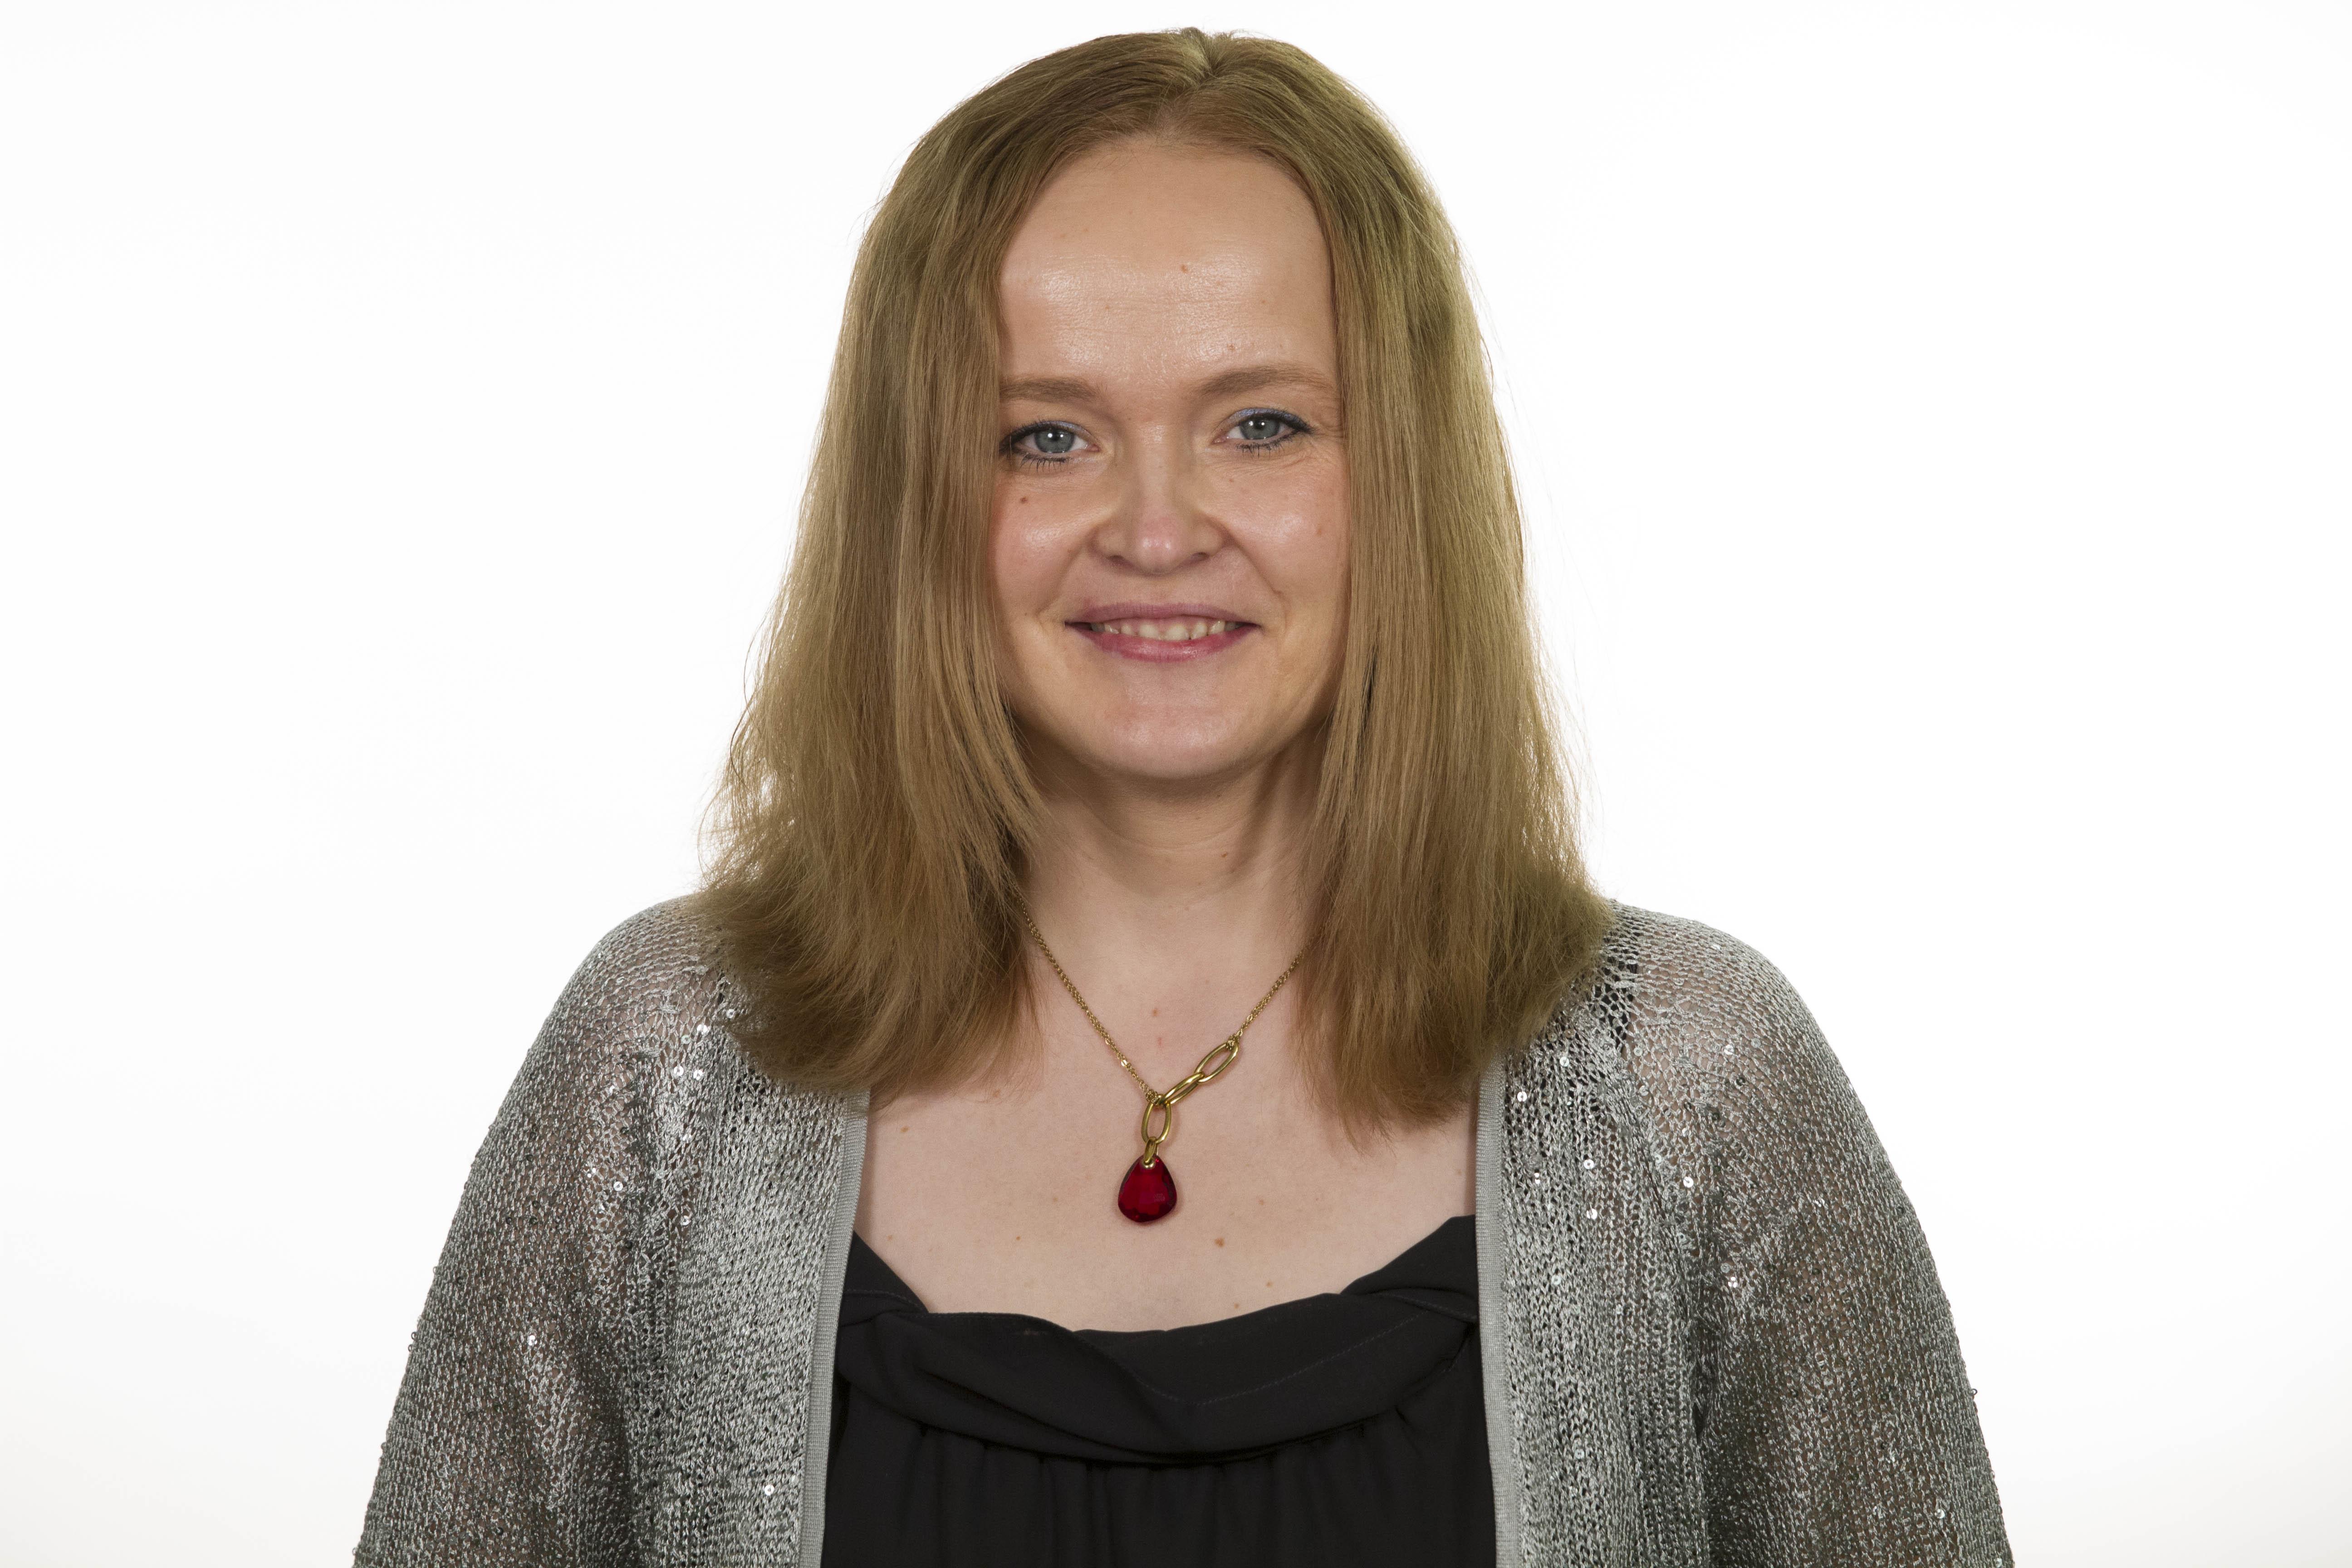 Marianna Roach